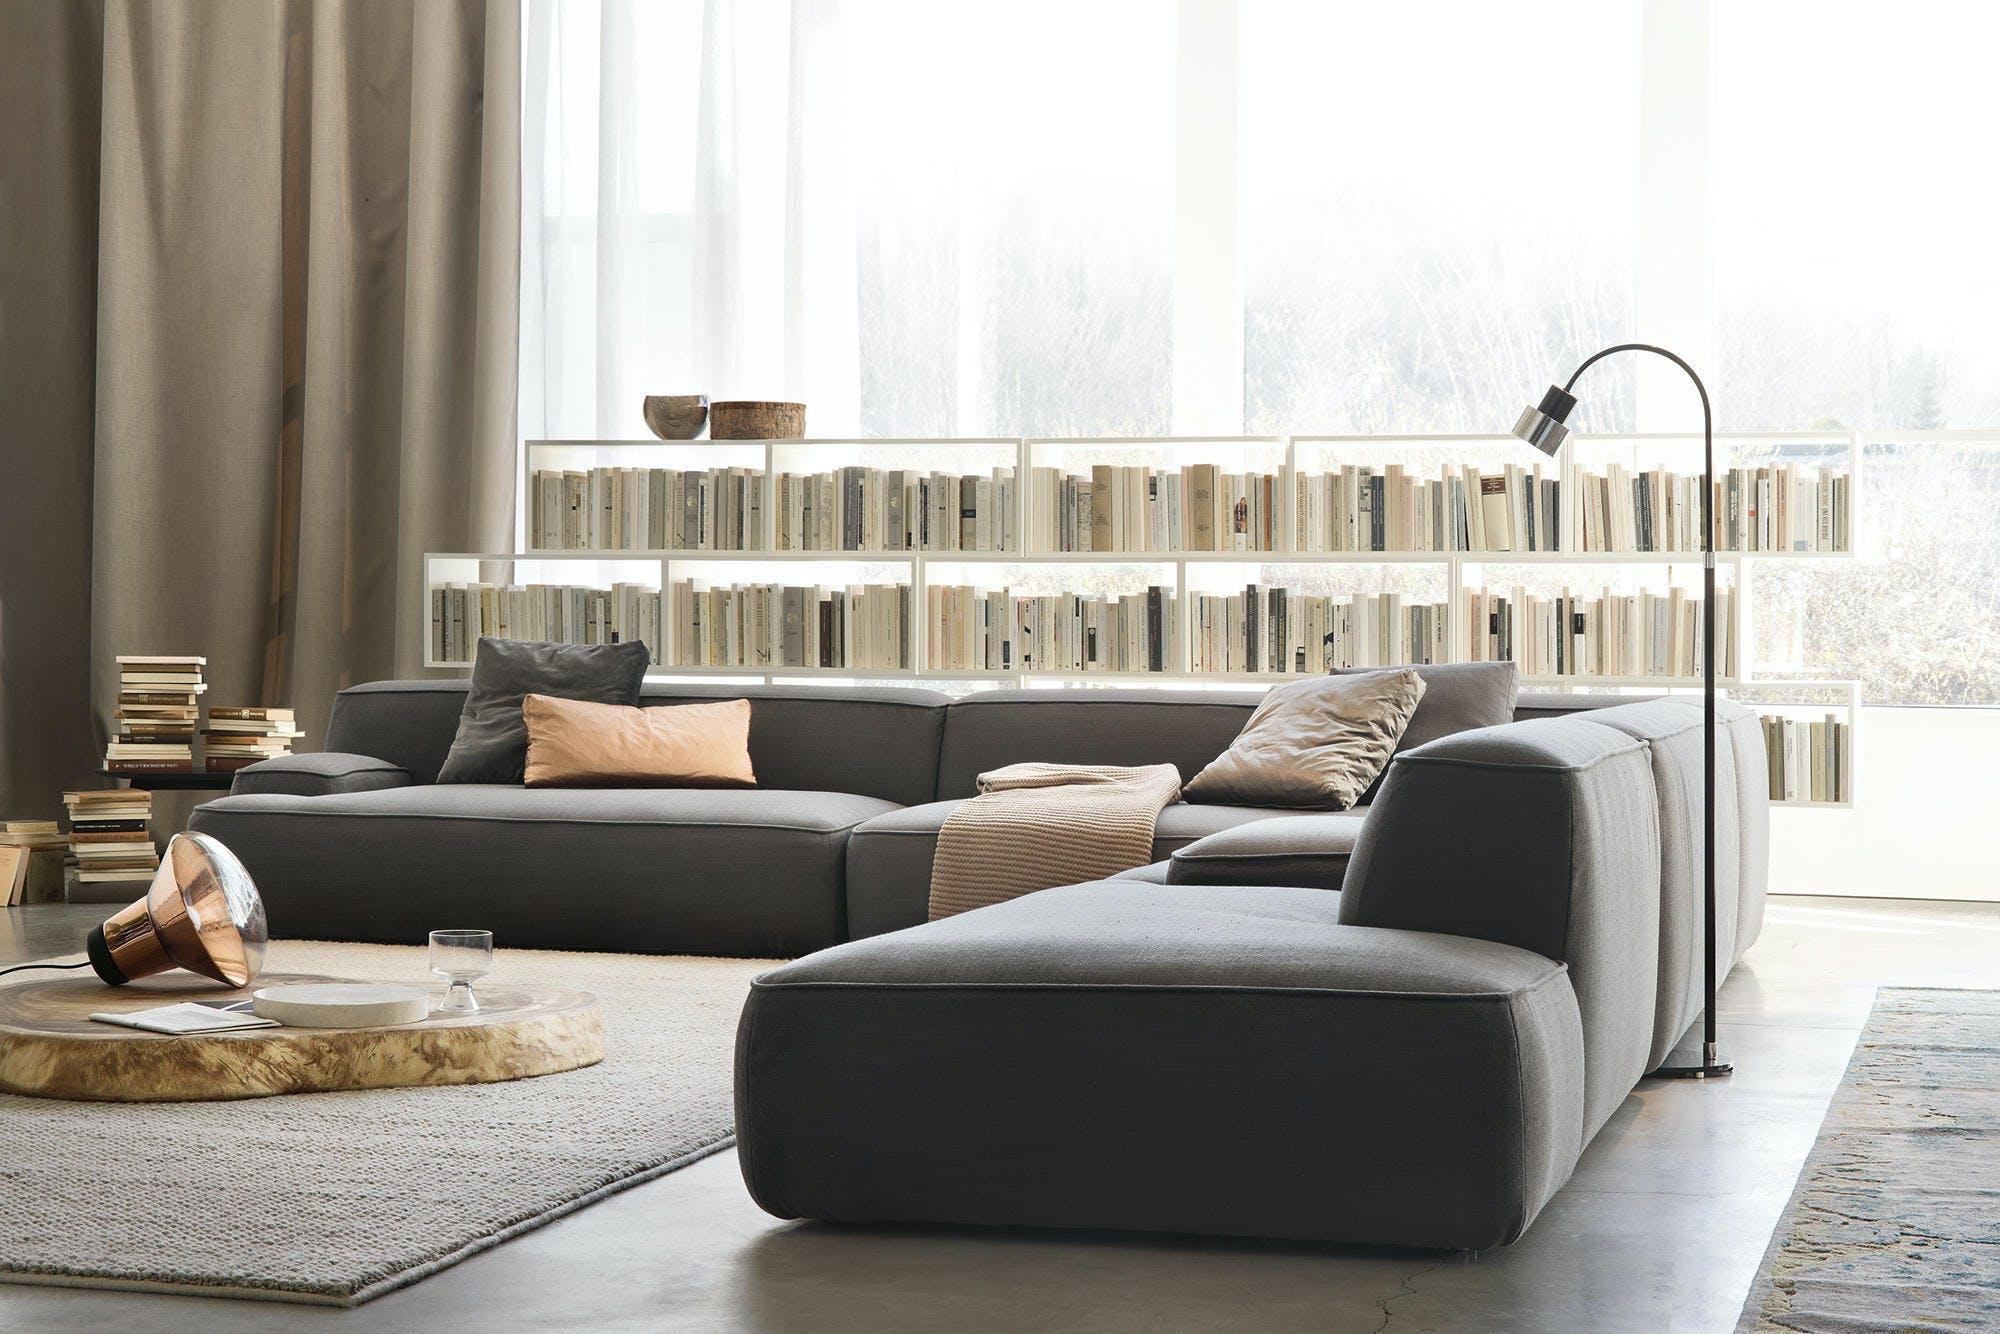 Lema-cloud-sofa-insitu-angle-haute-living